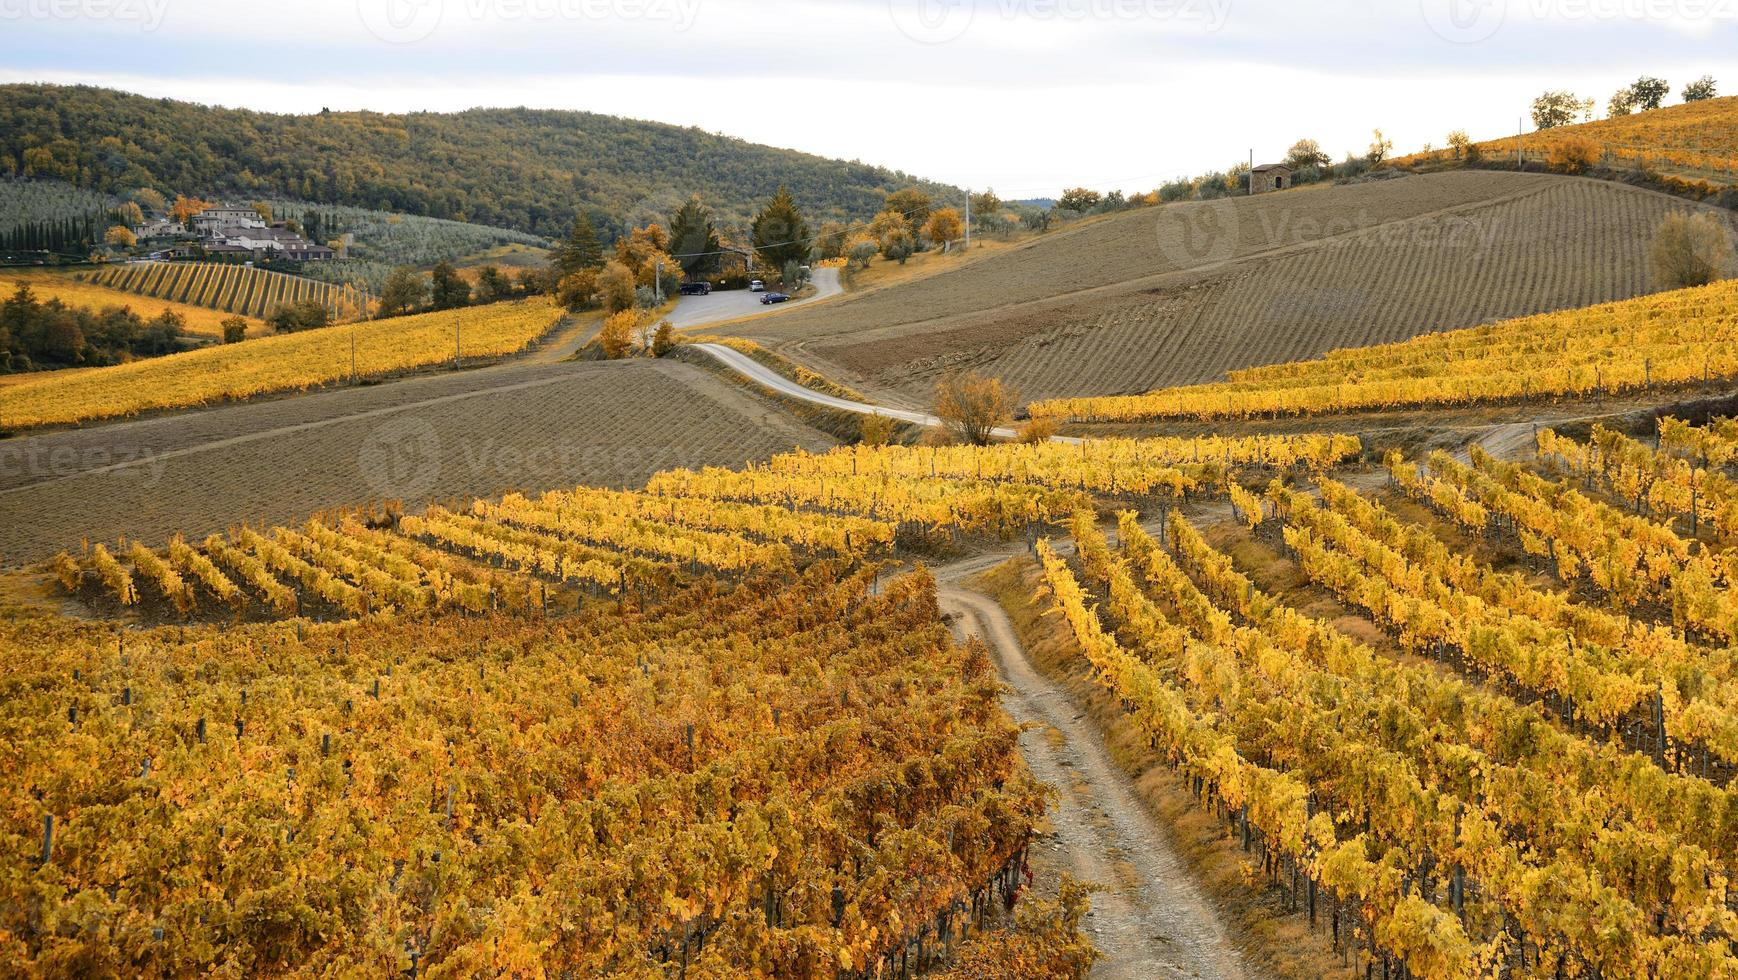 Autumn foliage in Italy photo